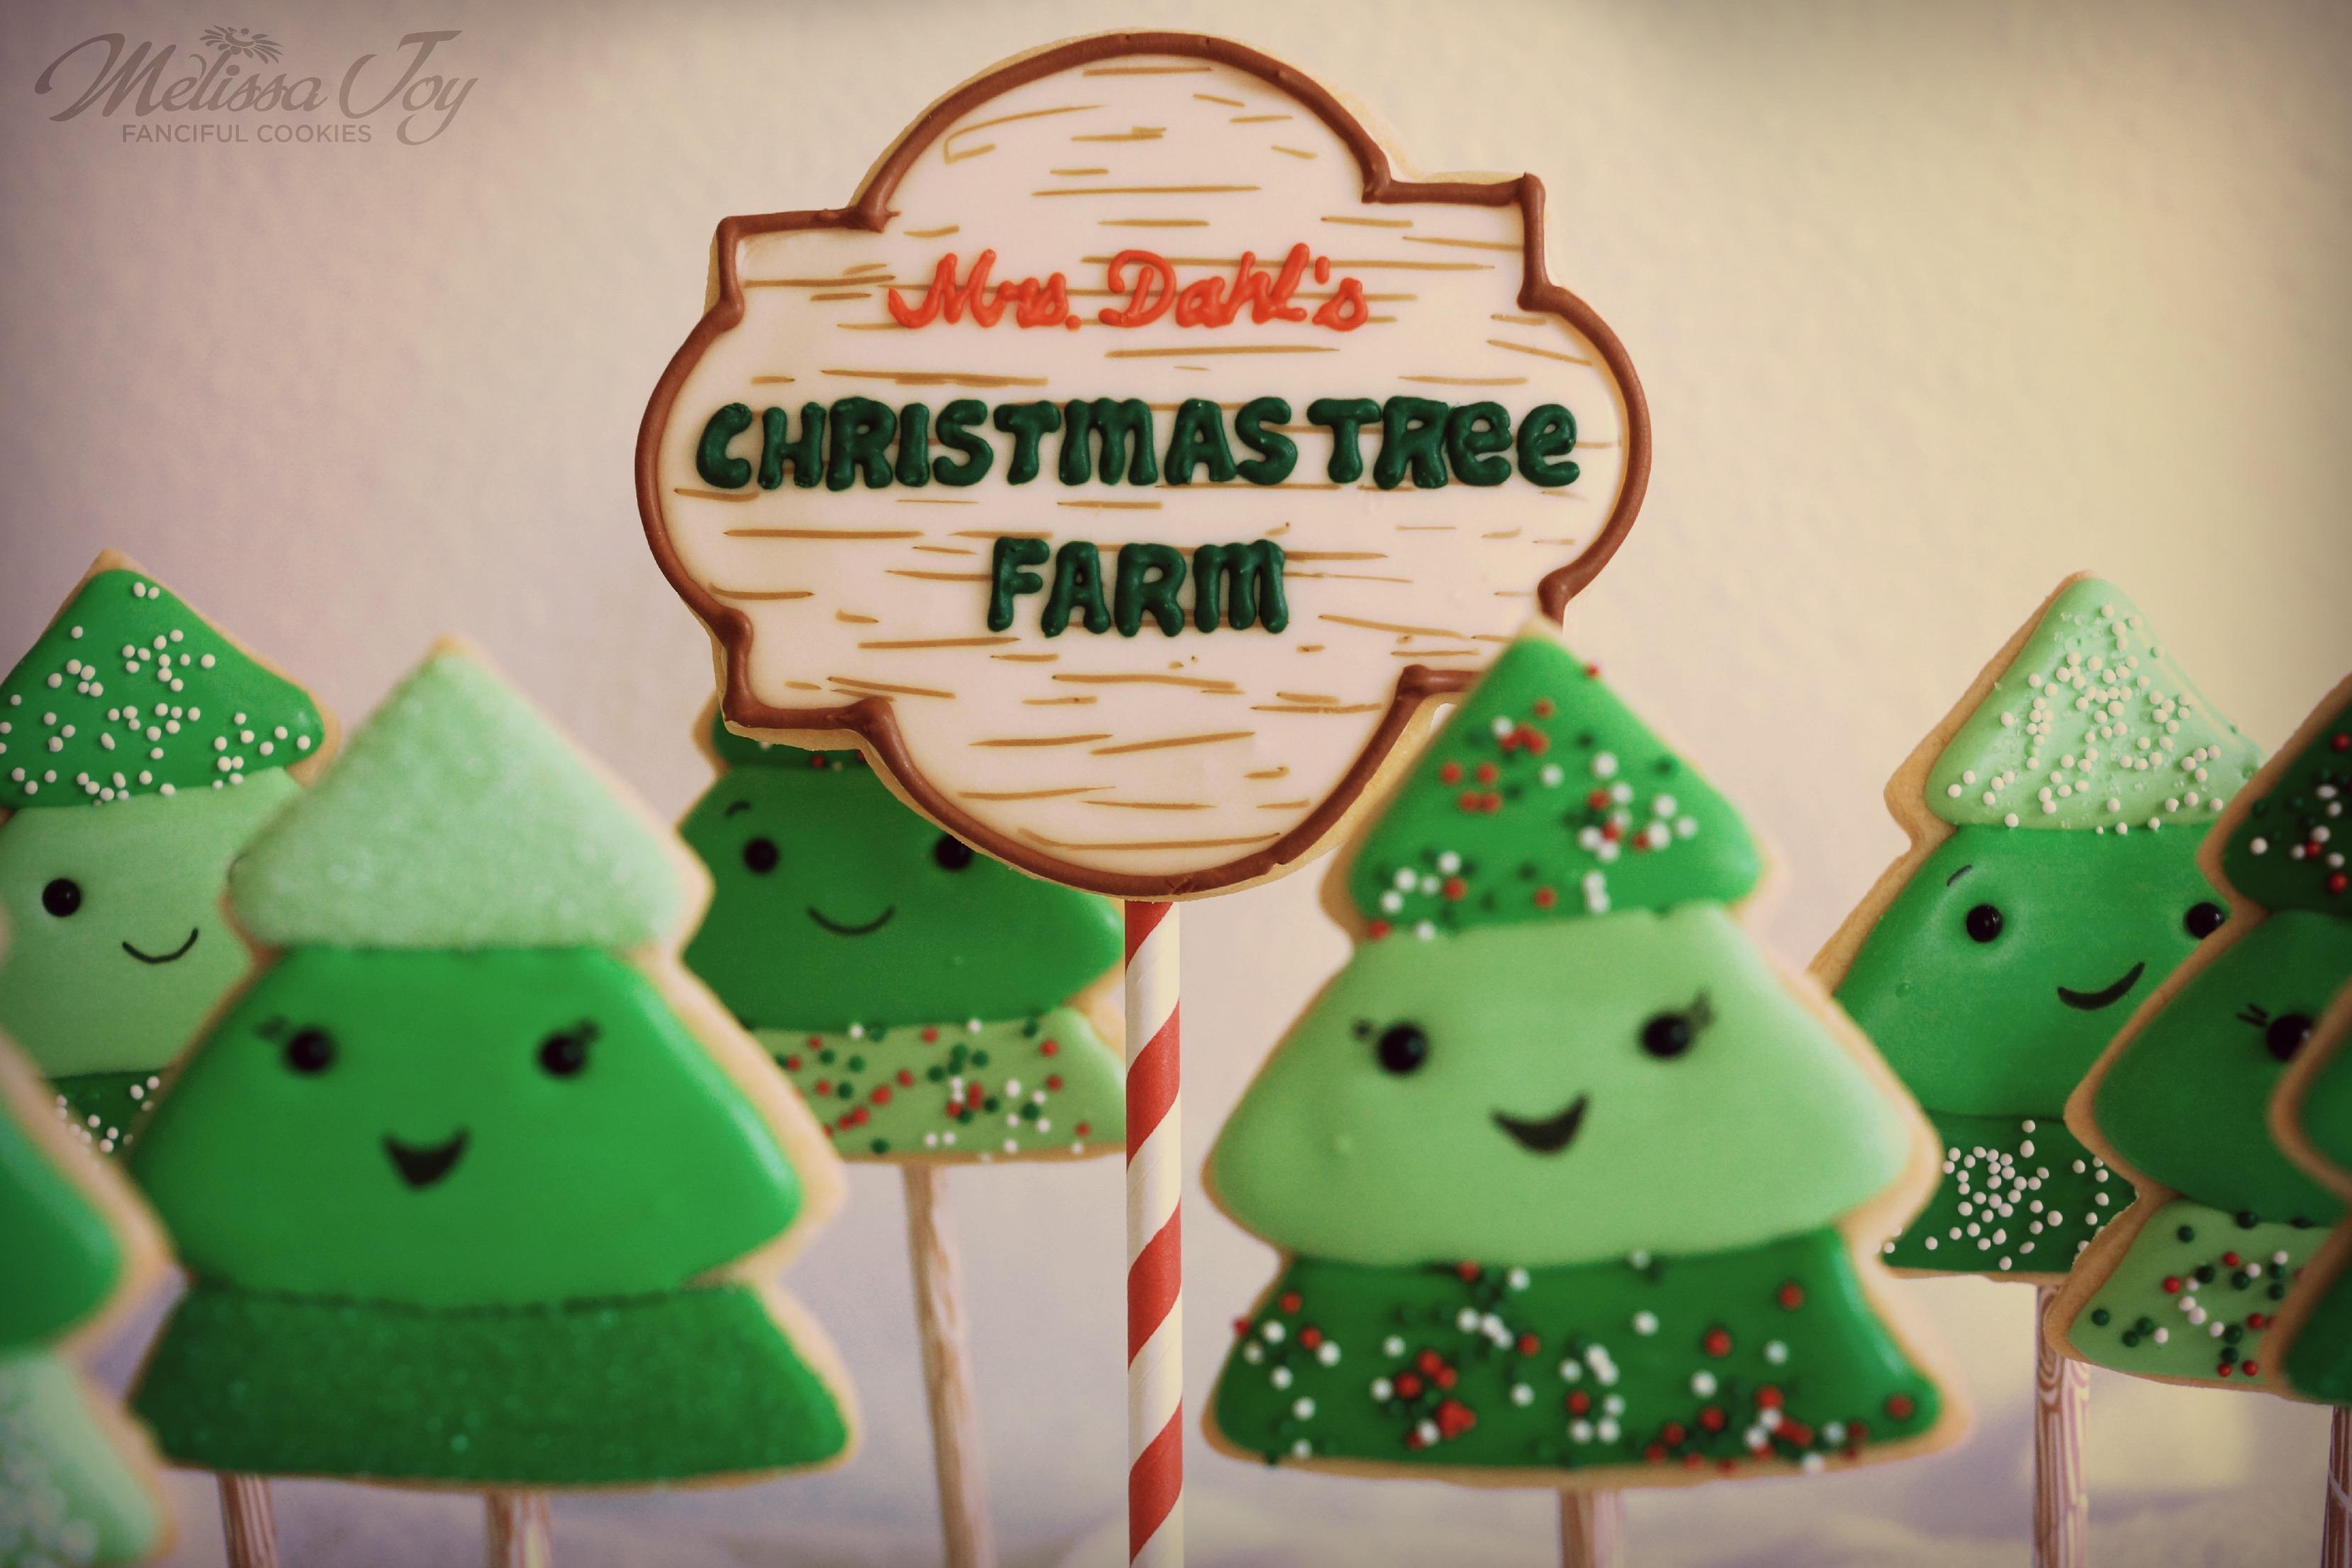 Christmas Tree Farm Sign Cookie